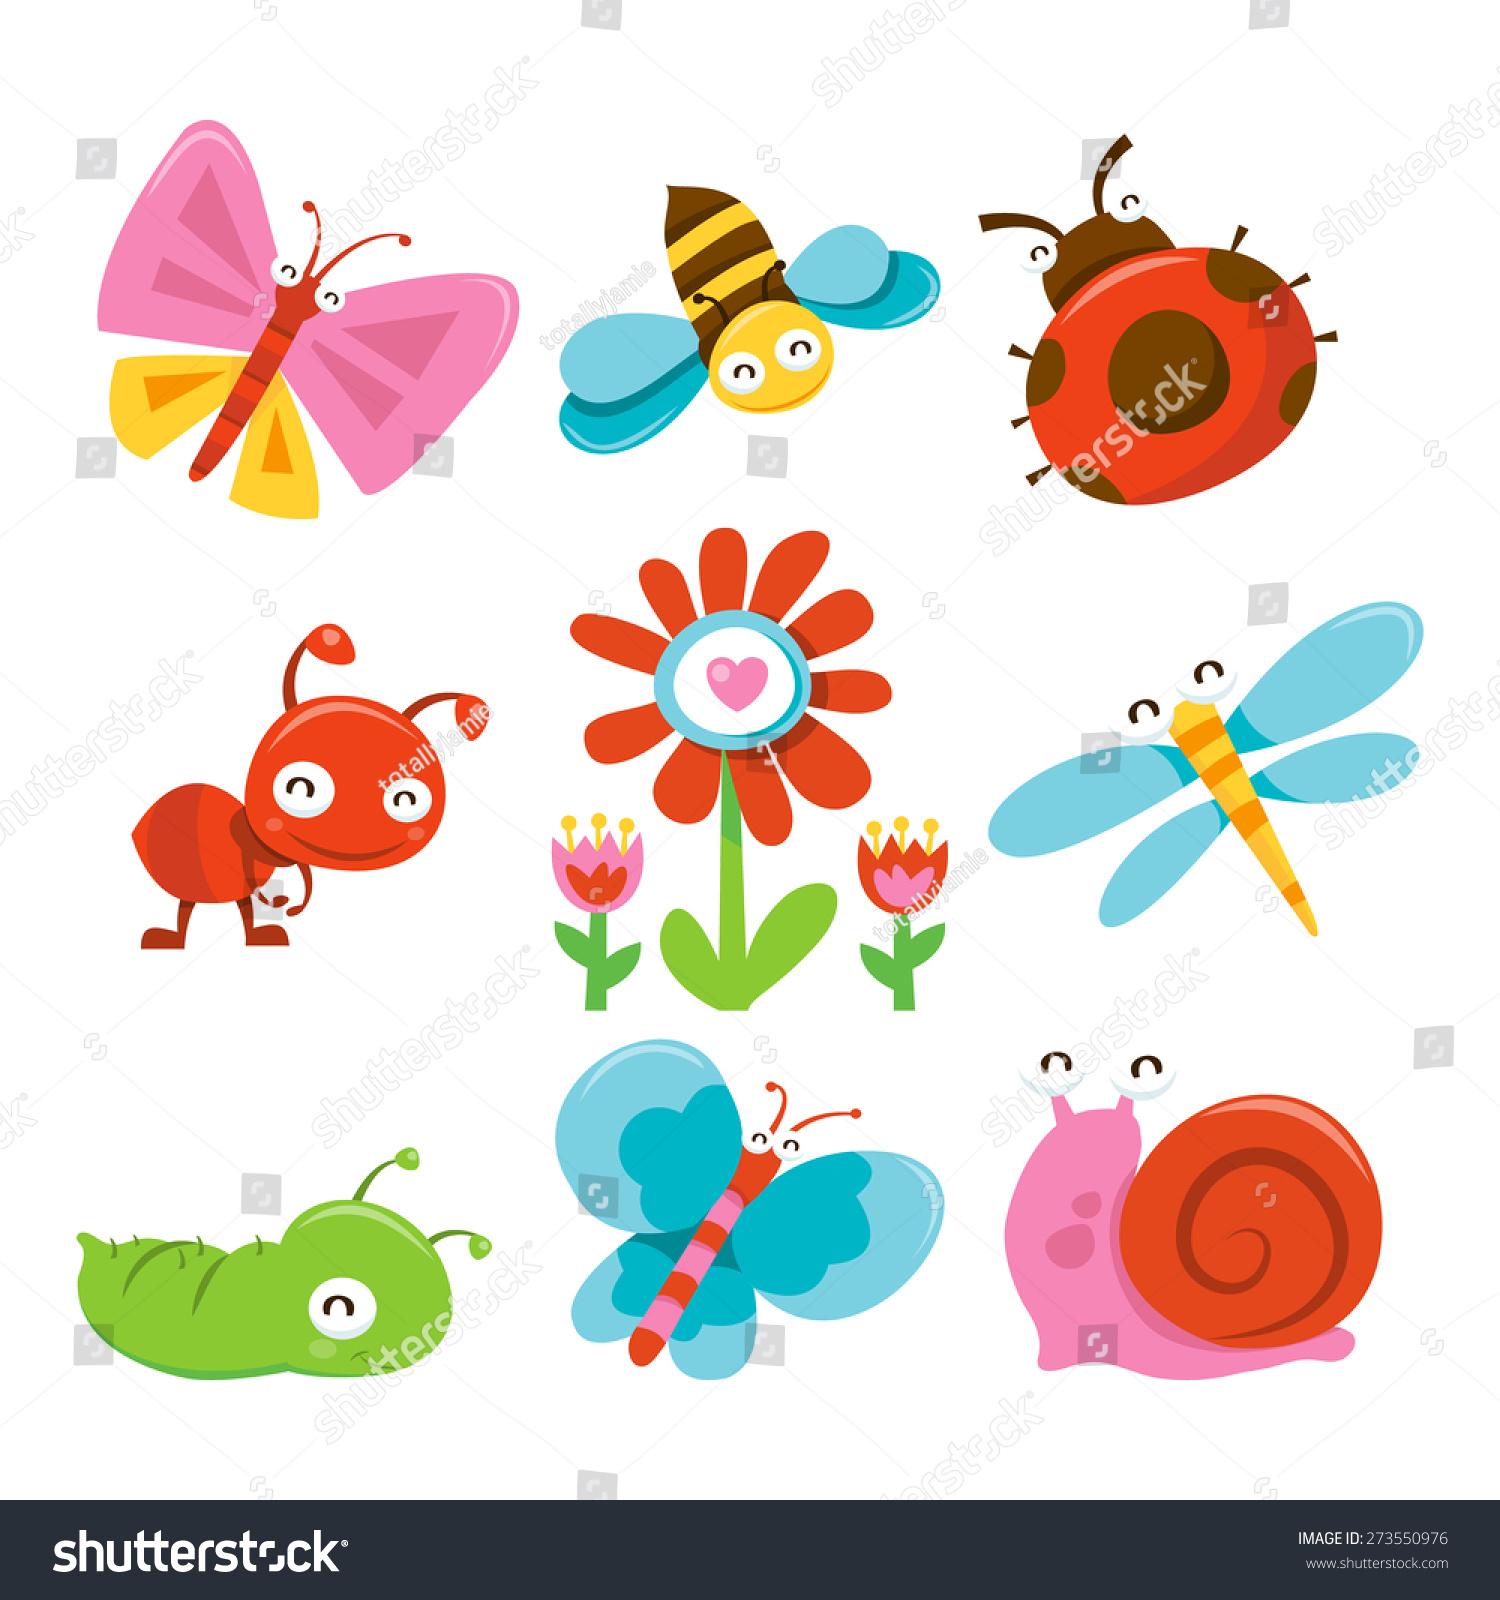 Garden Cute Cartoon: Cartoon Vector Illustration Happy Sweet Cute Stock Vector